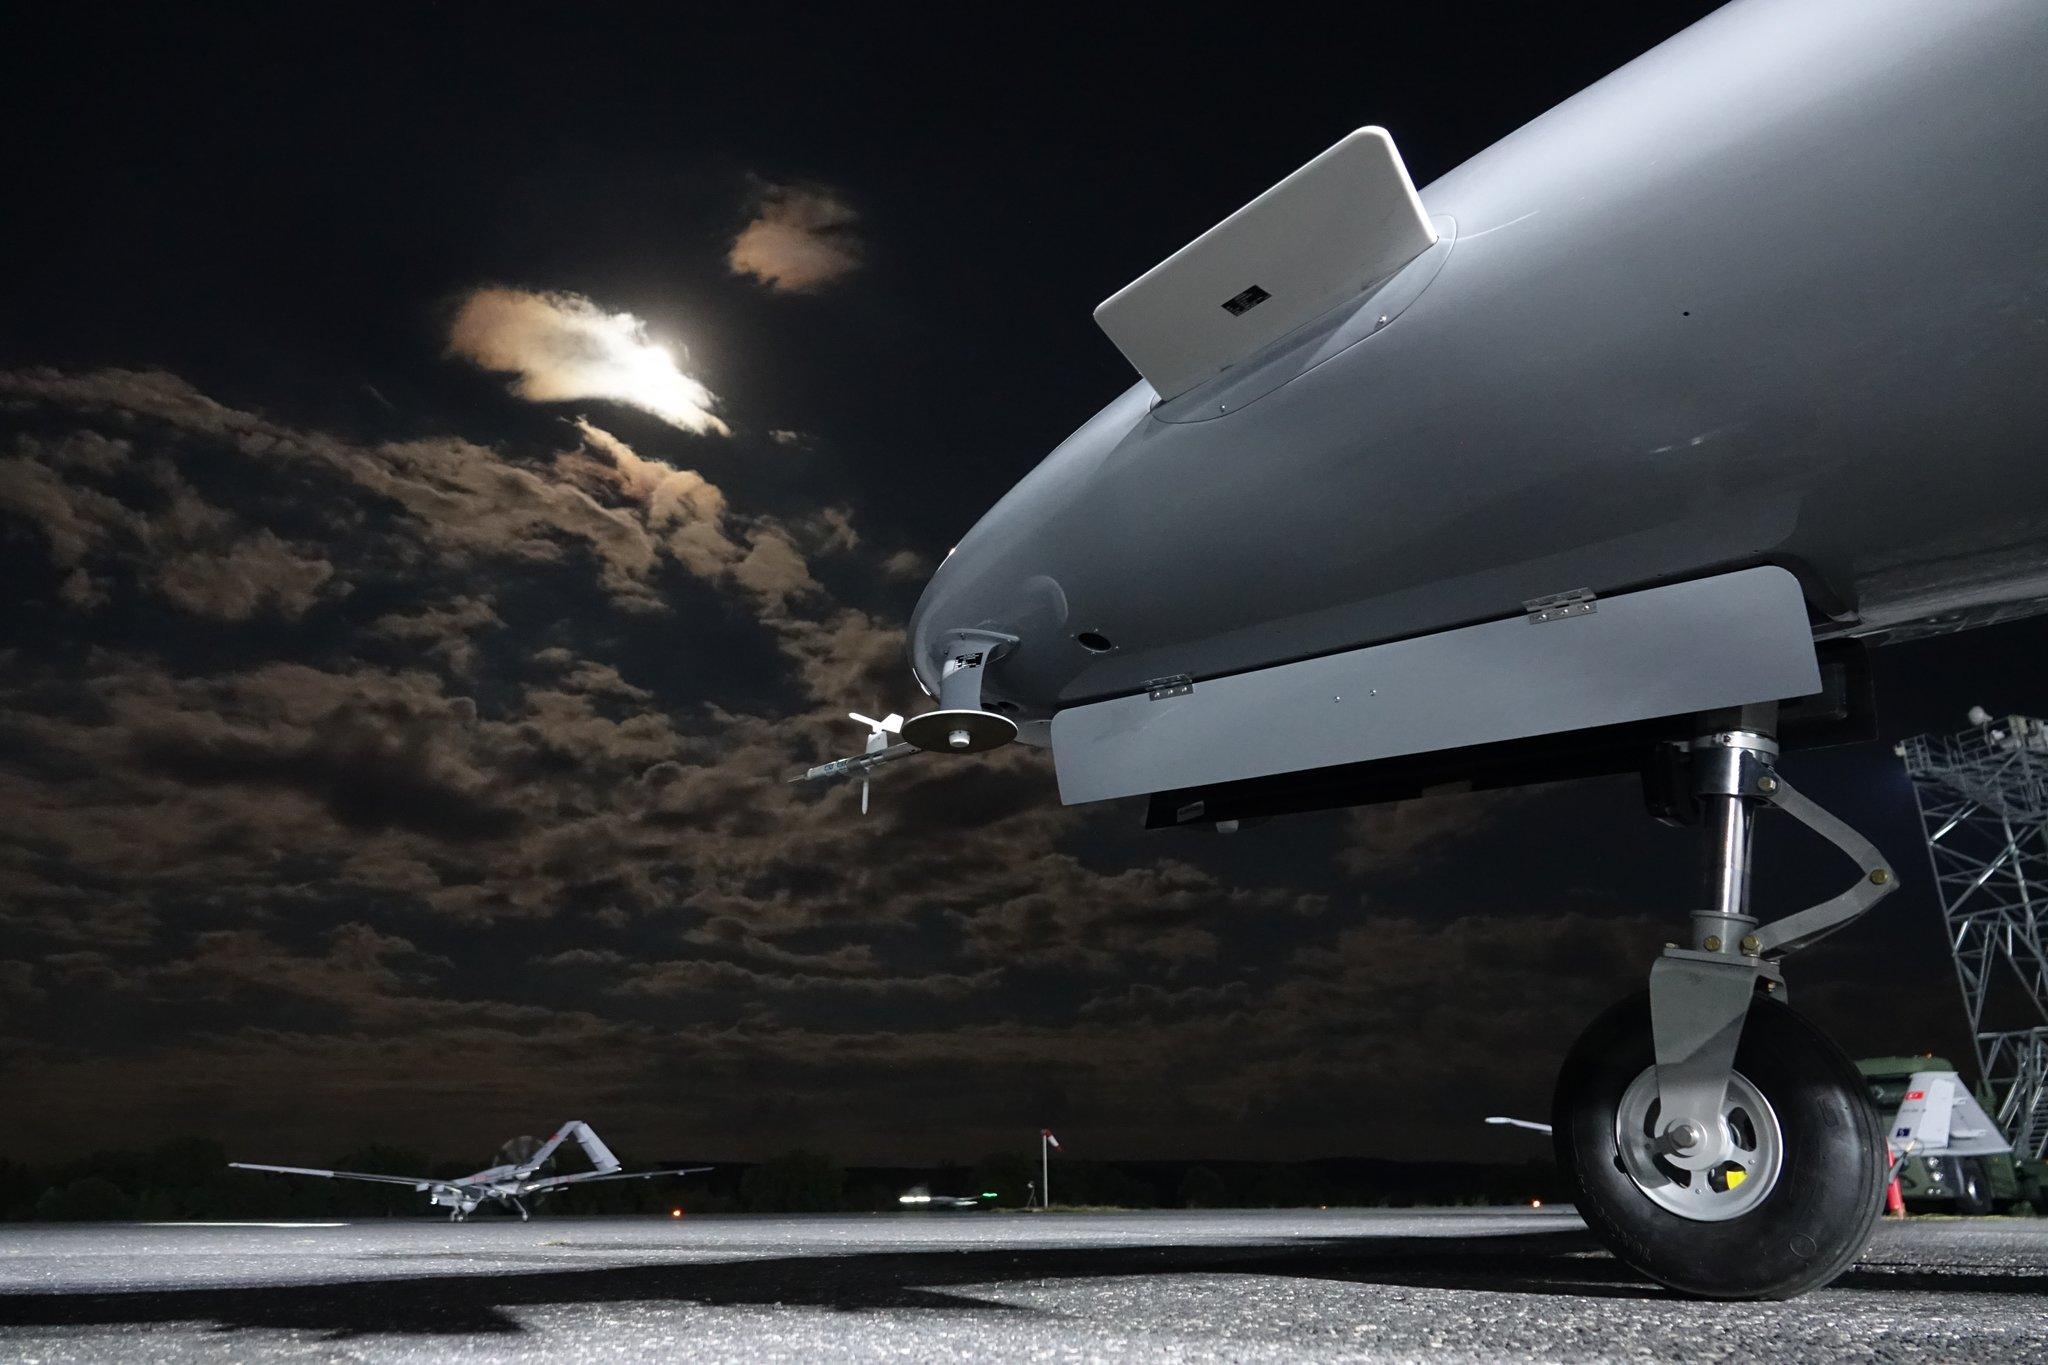 Bayraktar TB2A Unmanned Combat Aerial Vehicle